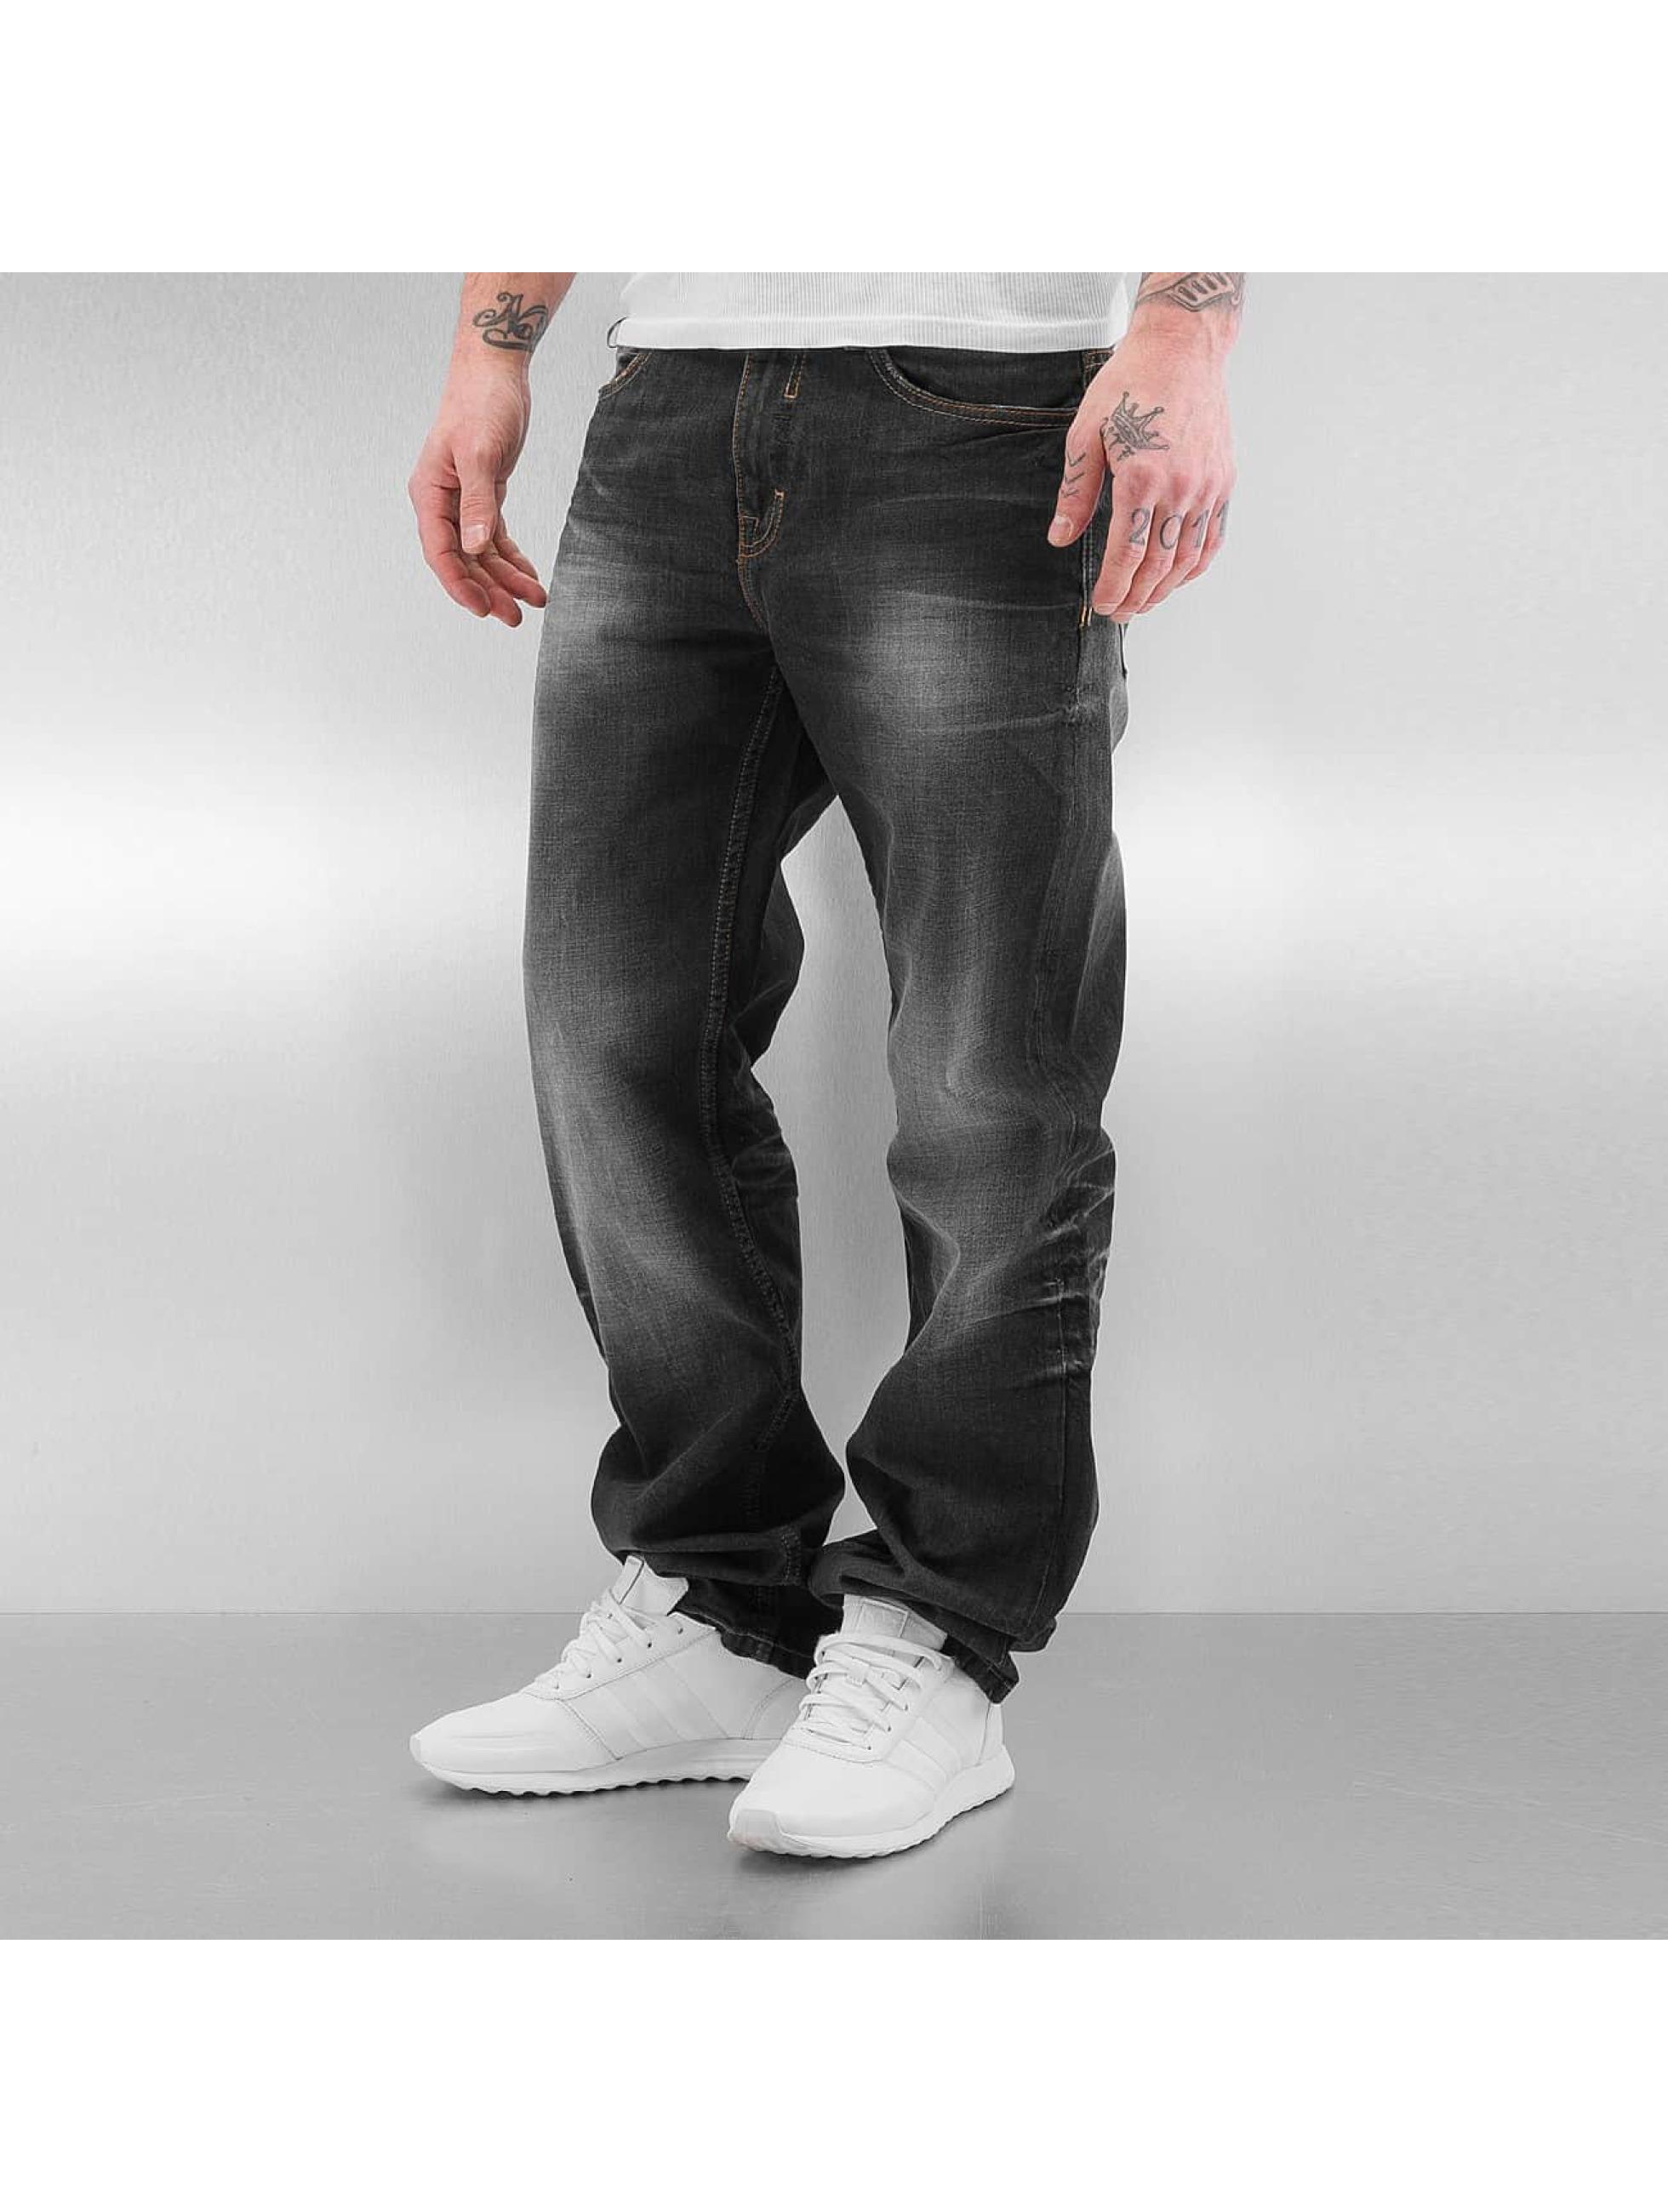 Pelle Pelle Männer Loose Fit Jeans Baxter in schwarz